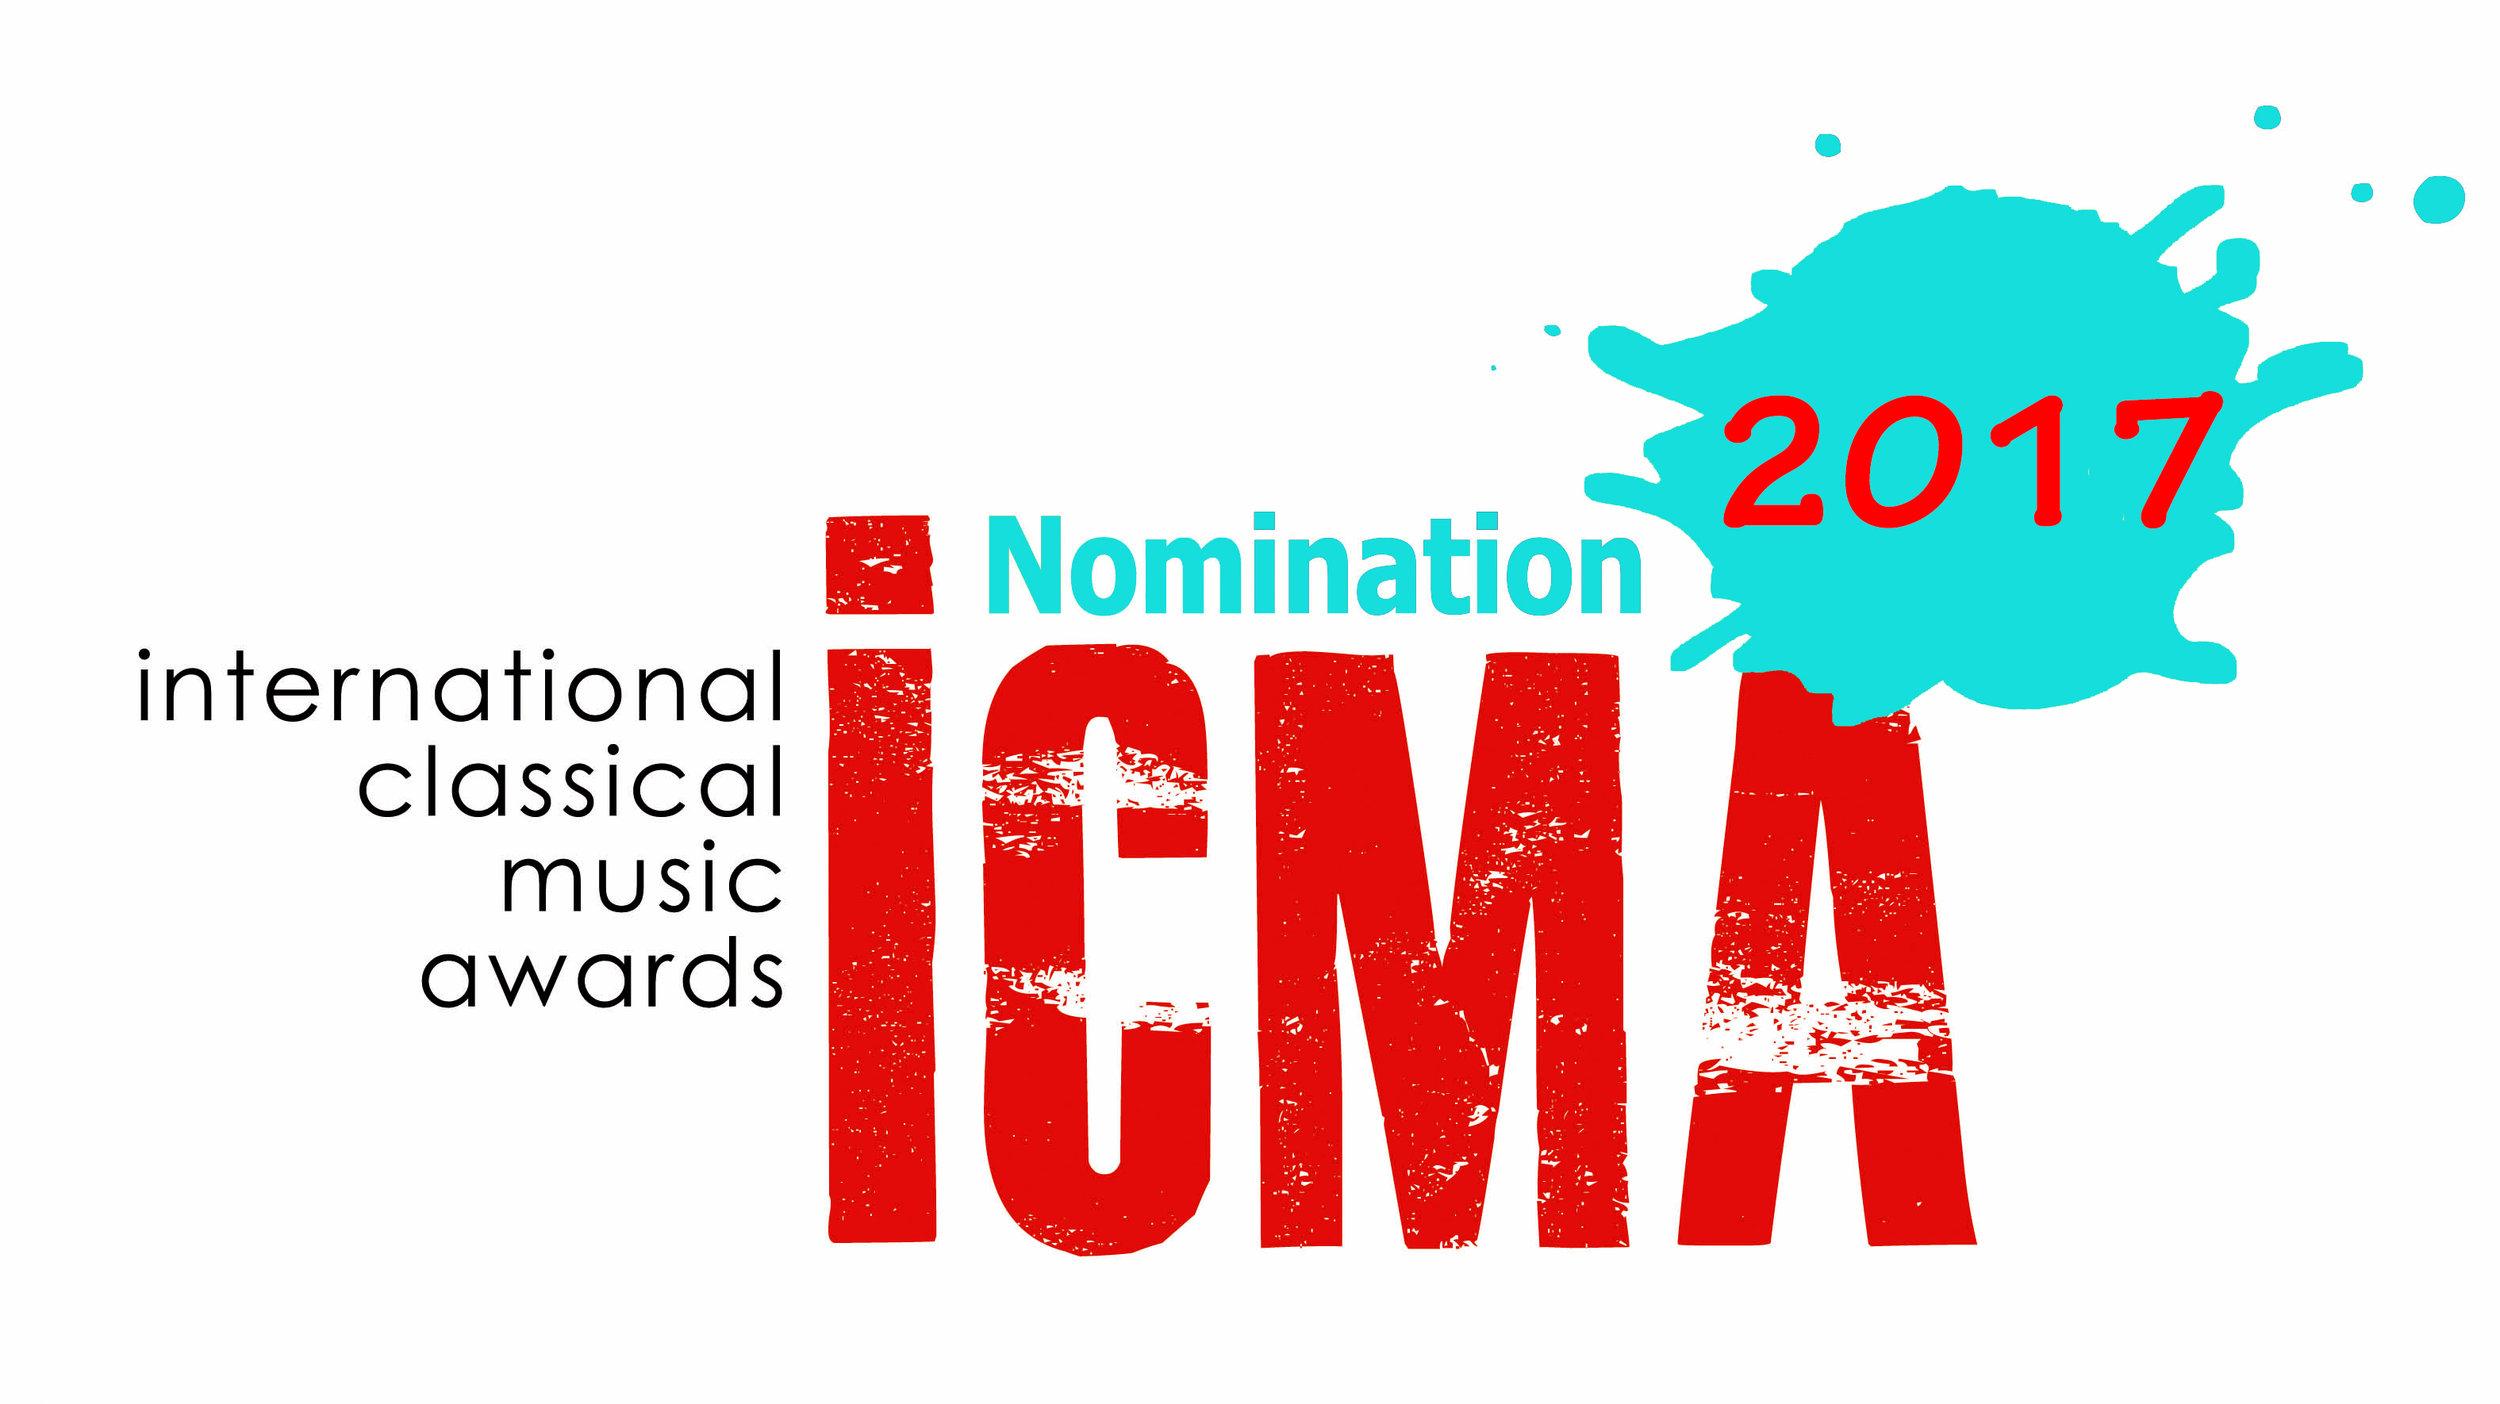 ICMA-nomination-2017.jpg